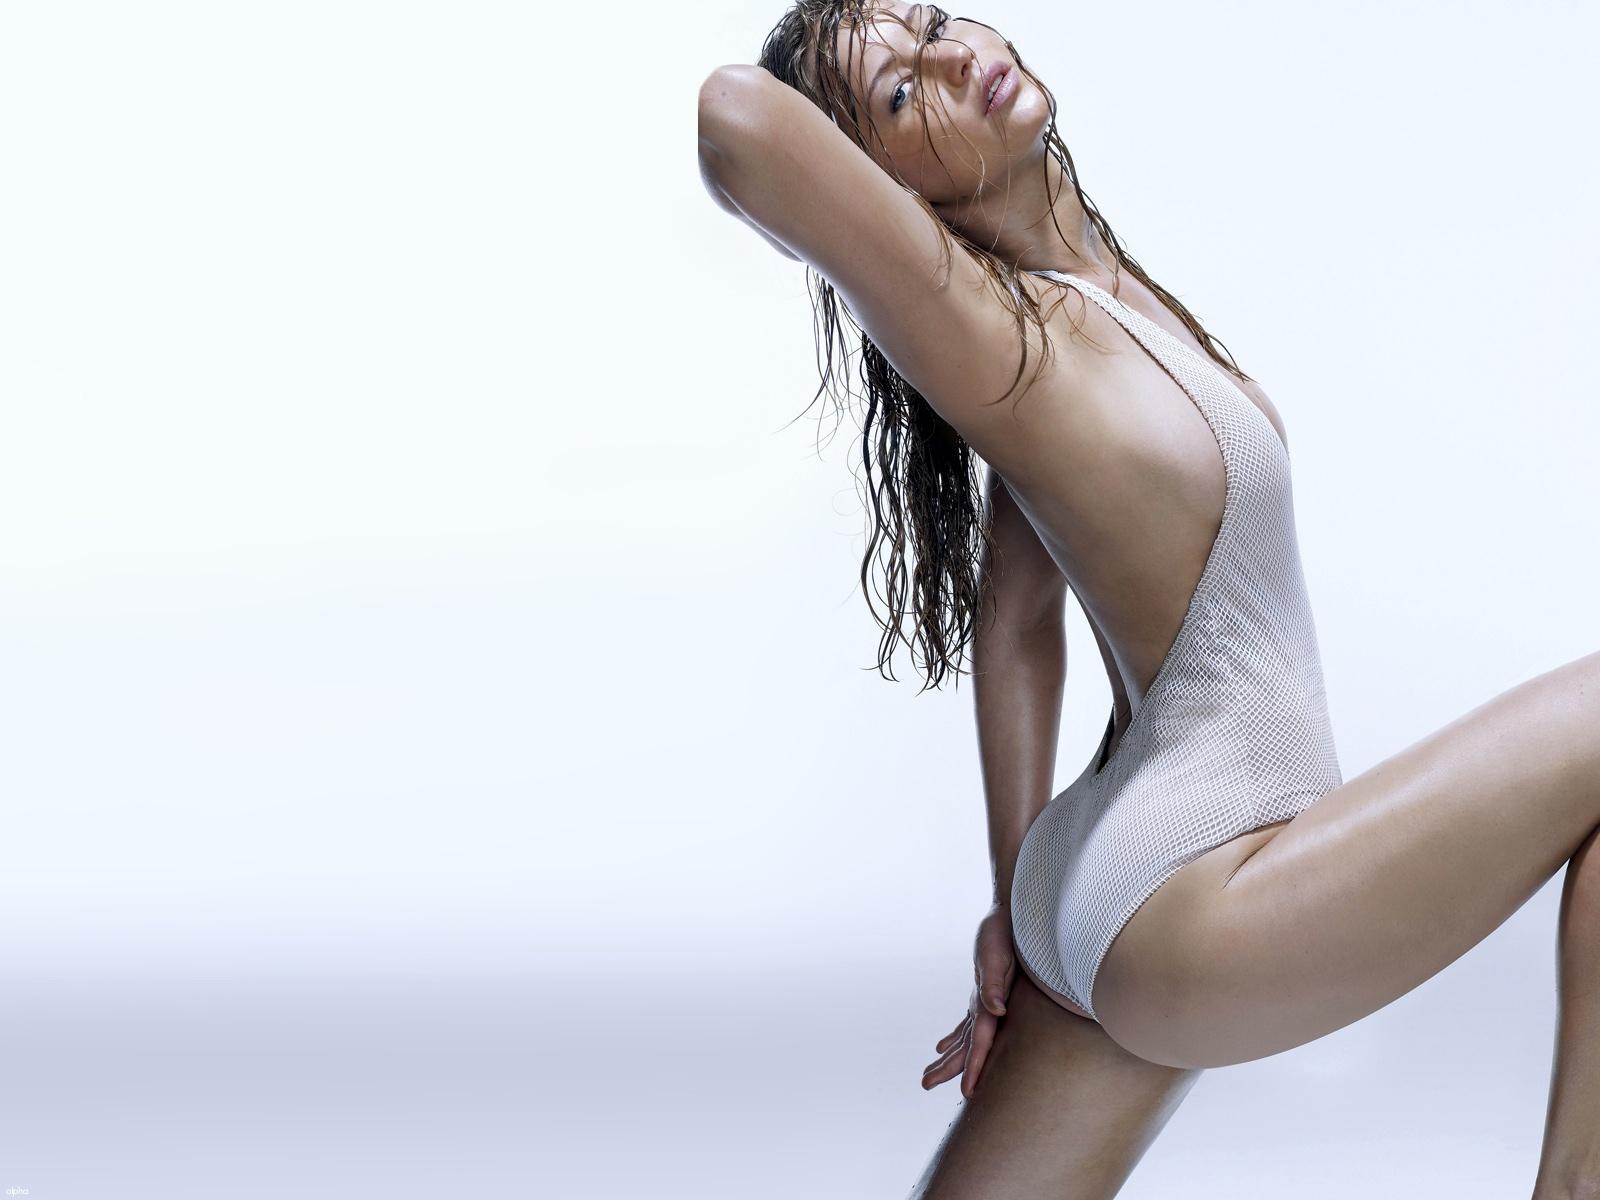 http://4.bp.blogspot.com/-9L0gZHjEztA/T5FNaSeXl8I/AAAAAAAAObE/Tw6LTtBn-nU/s1600/sploogeblog_jennifer_lawrence_cleavage_swimwear_wallpaper_03.jpg